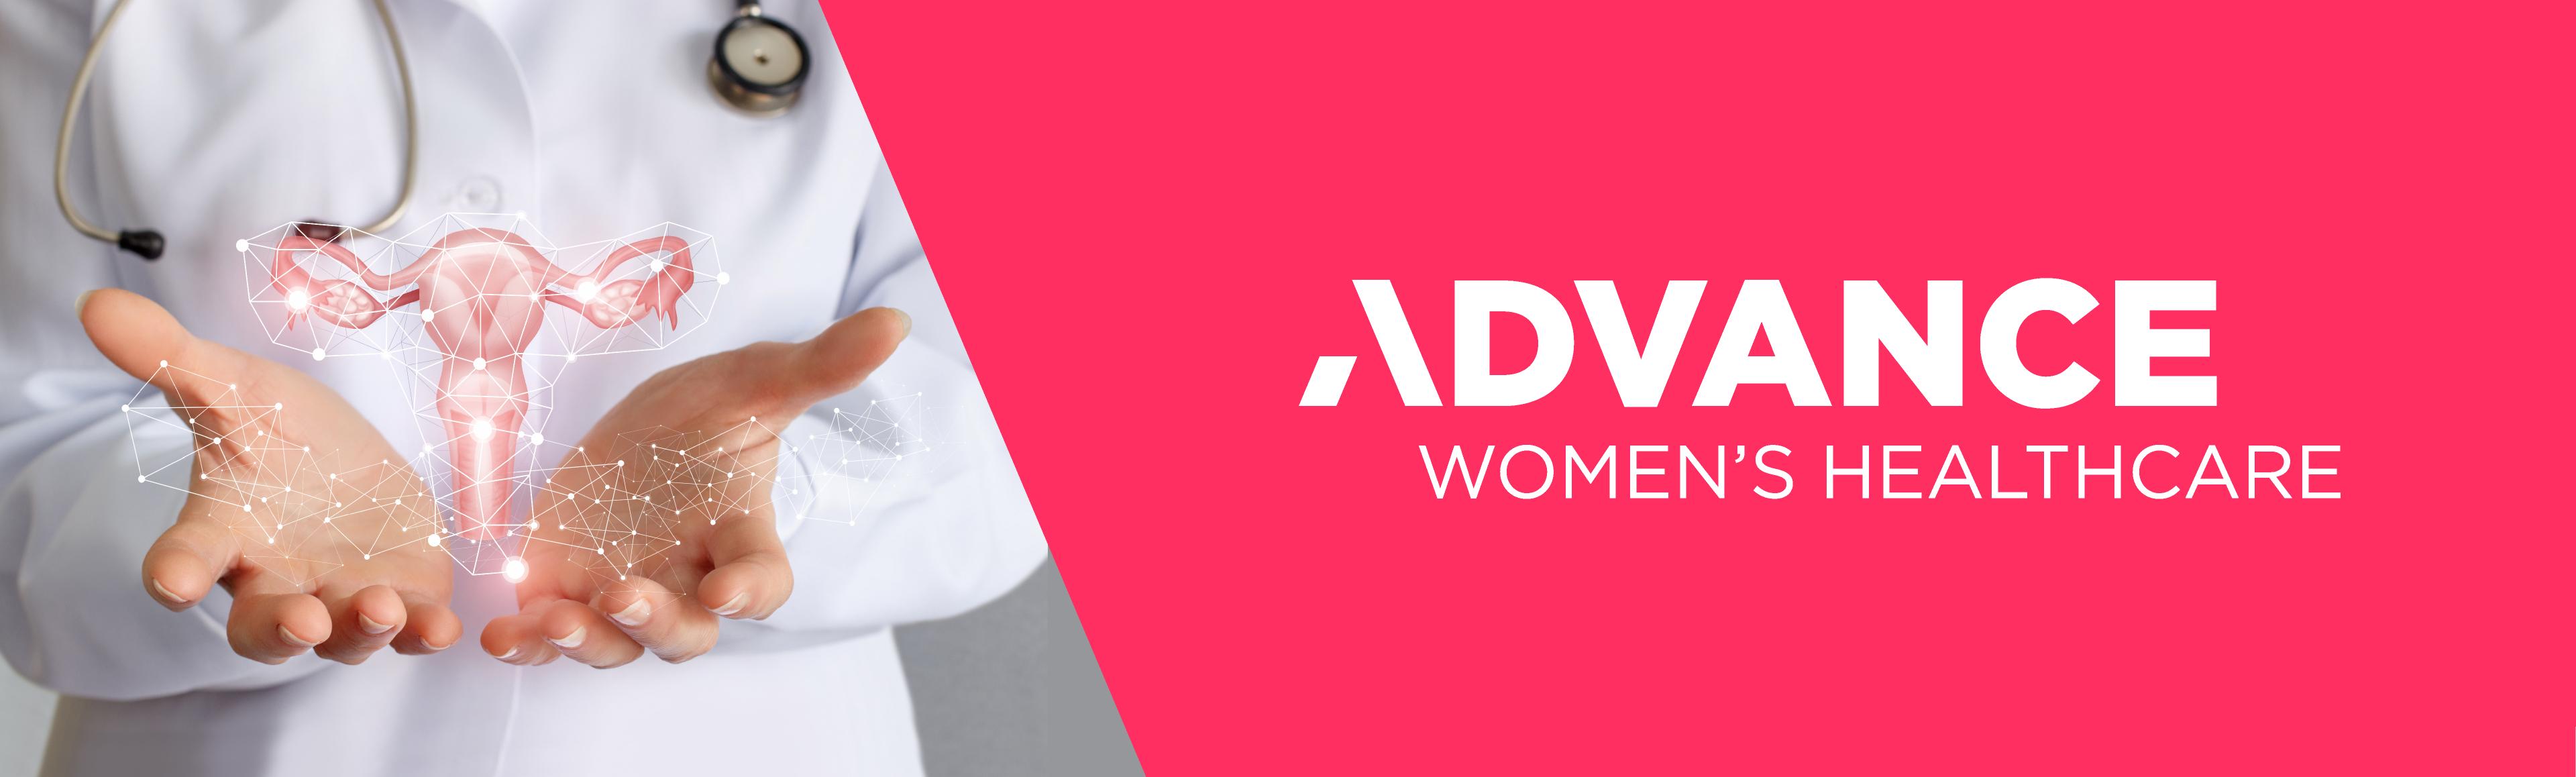 Bayer Advance Women's Healthcare